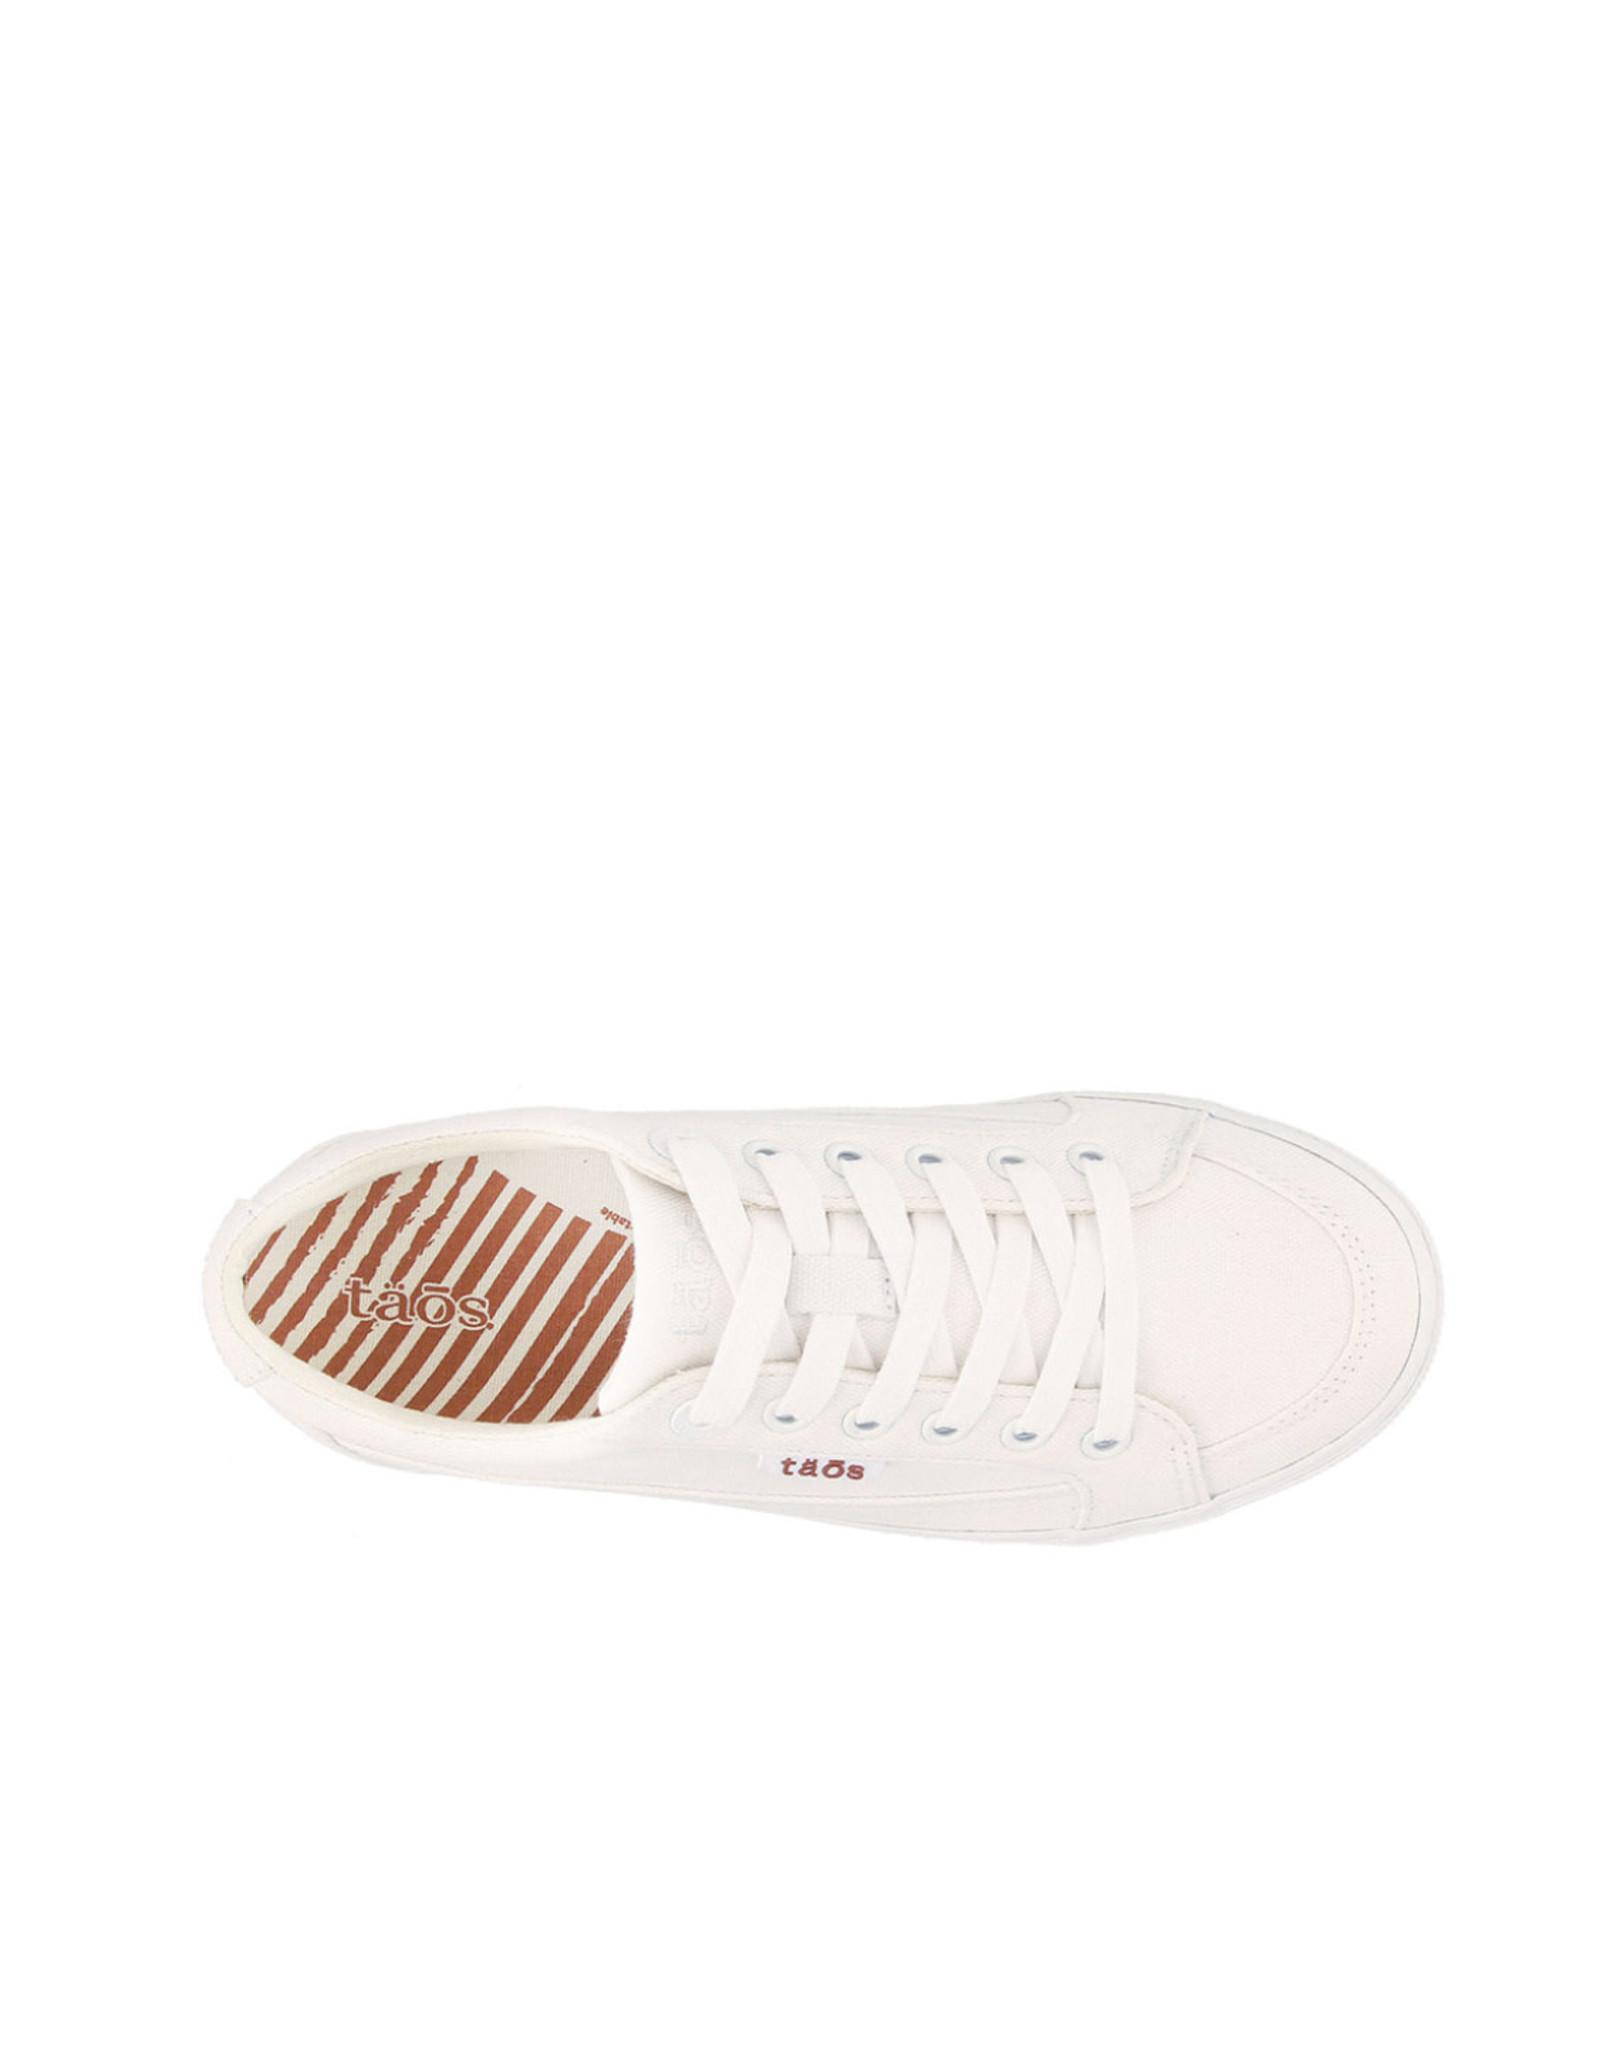 Taos Footwear Taos Moc Star Canvas Sneaker